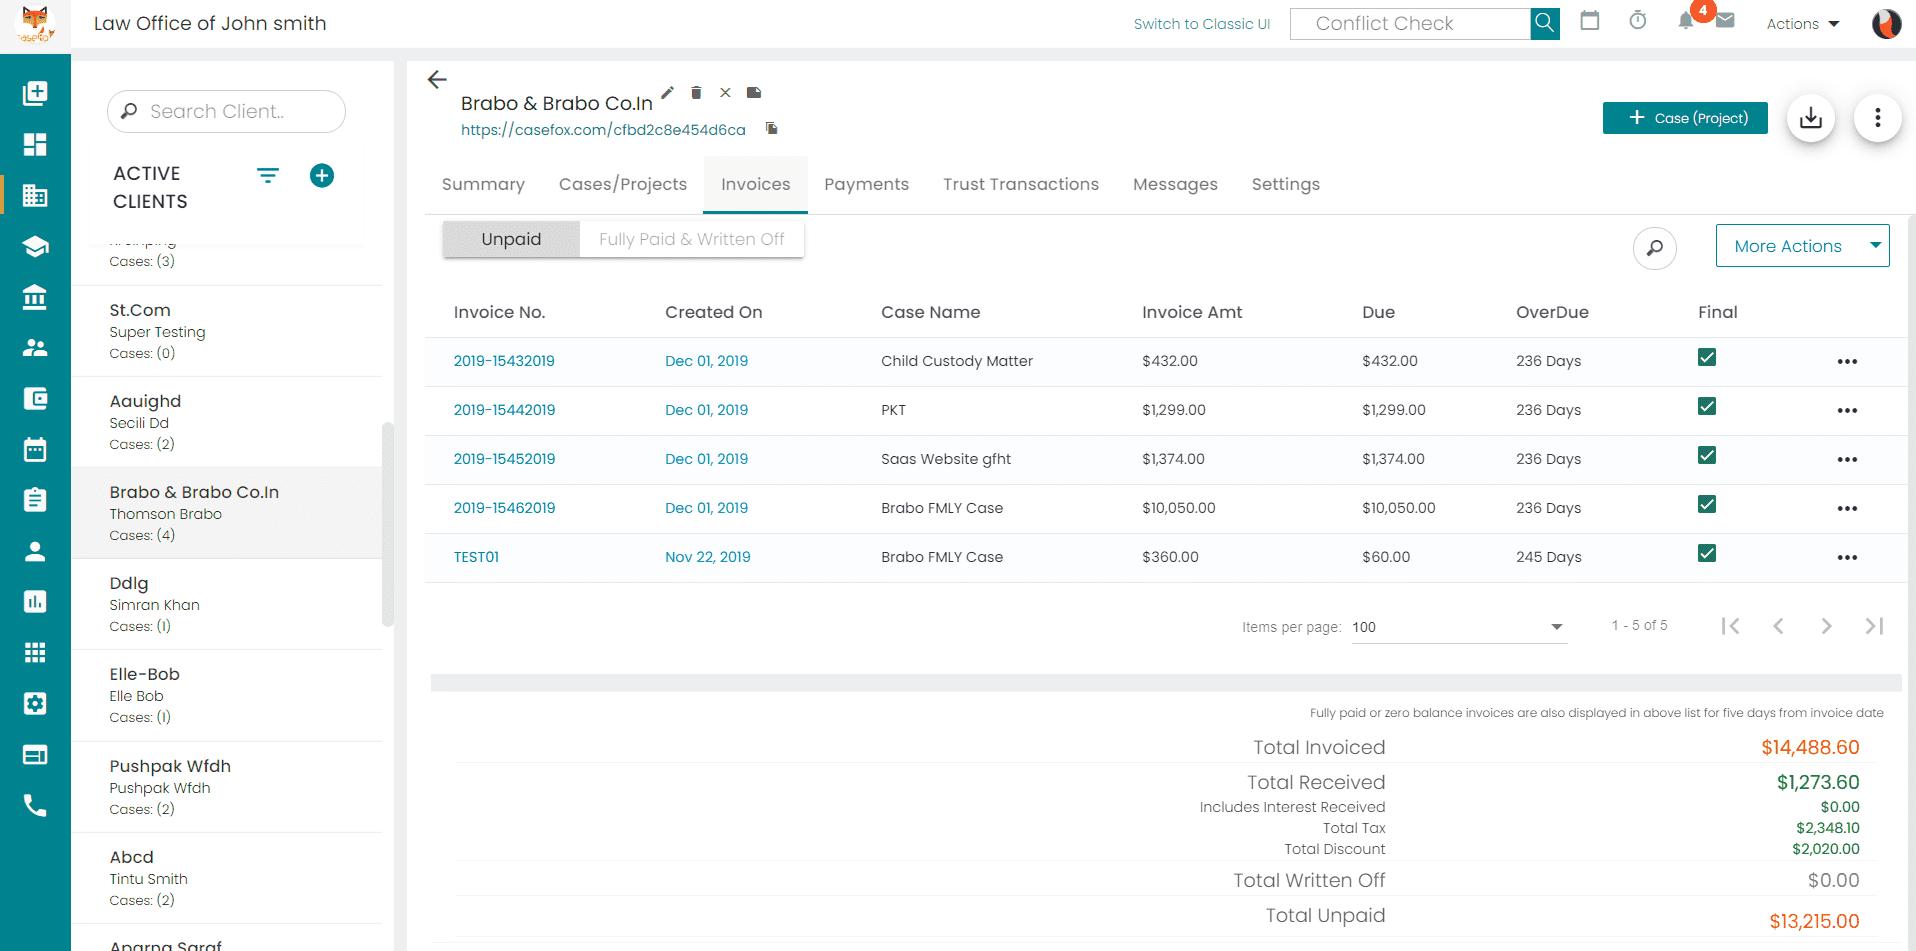 CaseFox Client Management Software